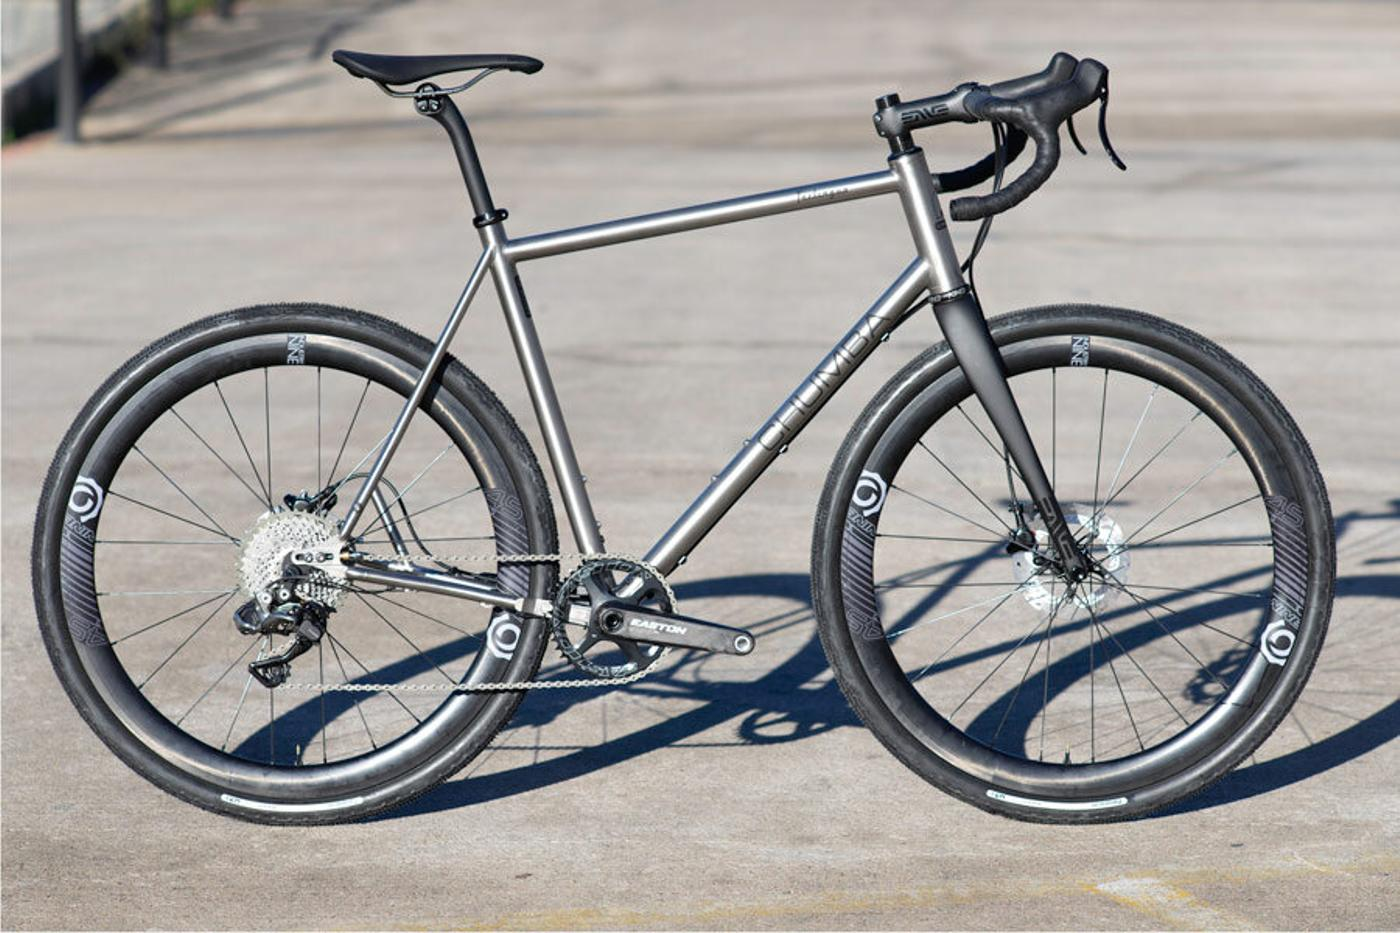 Chumba's Updated 2020 Terlingua Titanium Gravel Bike